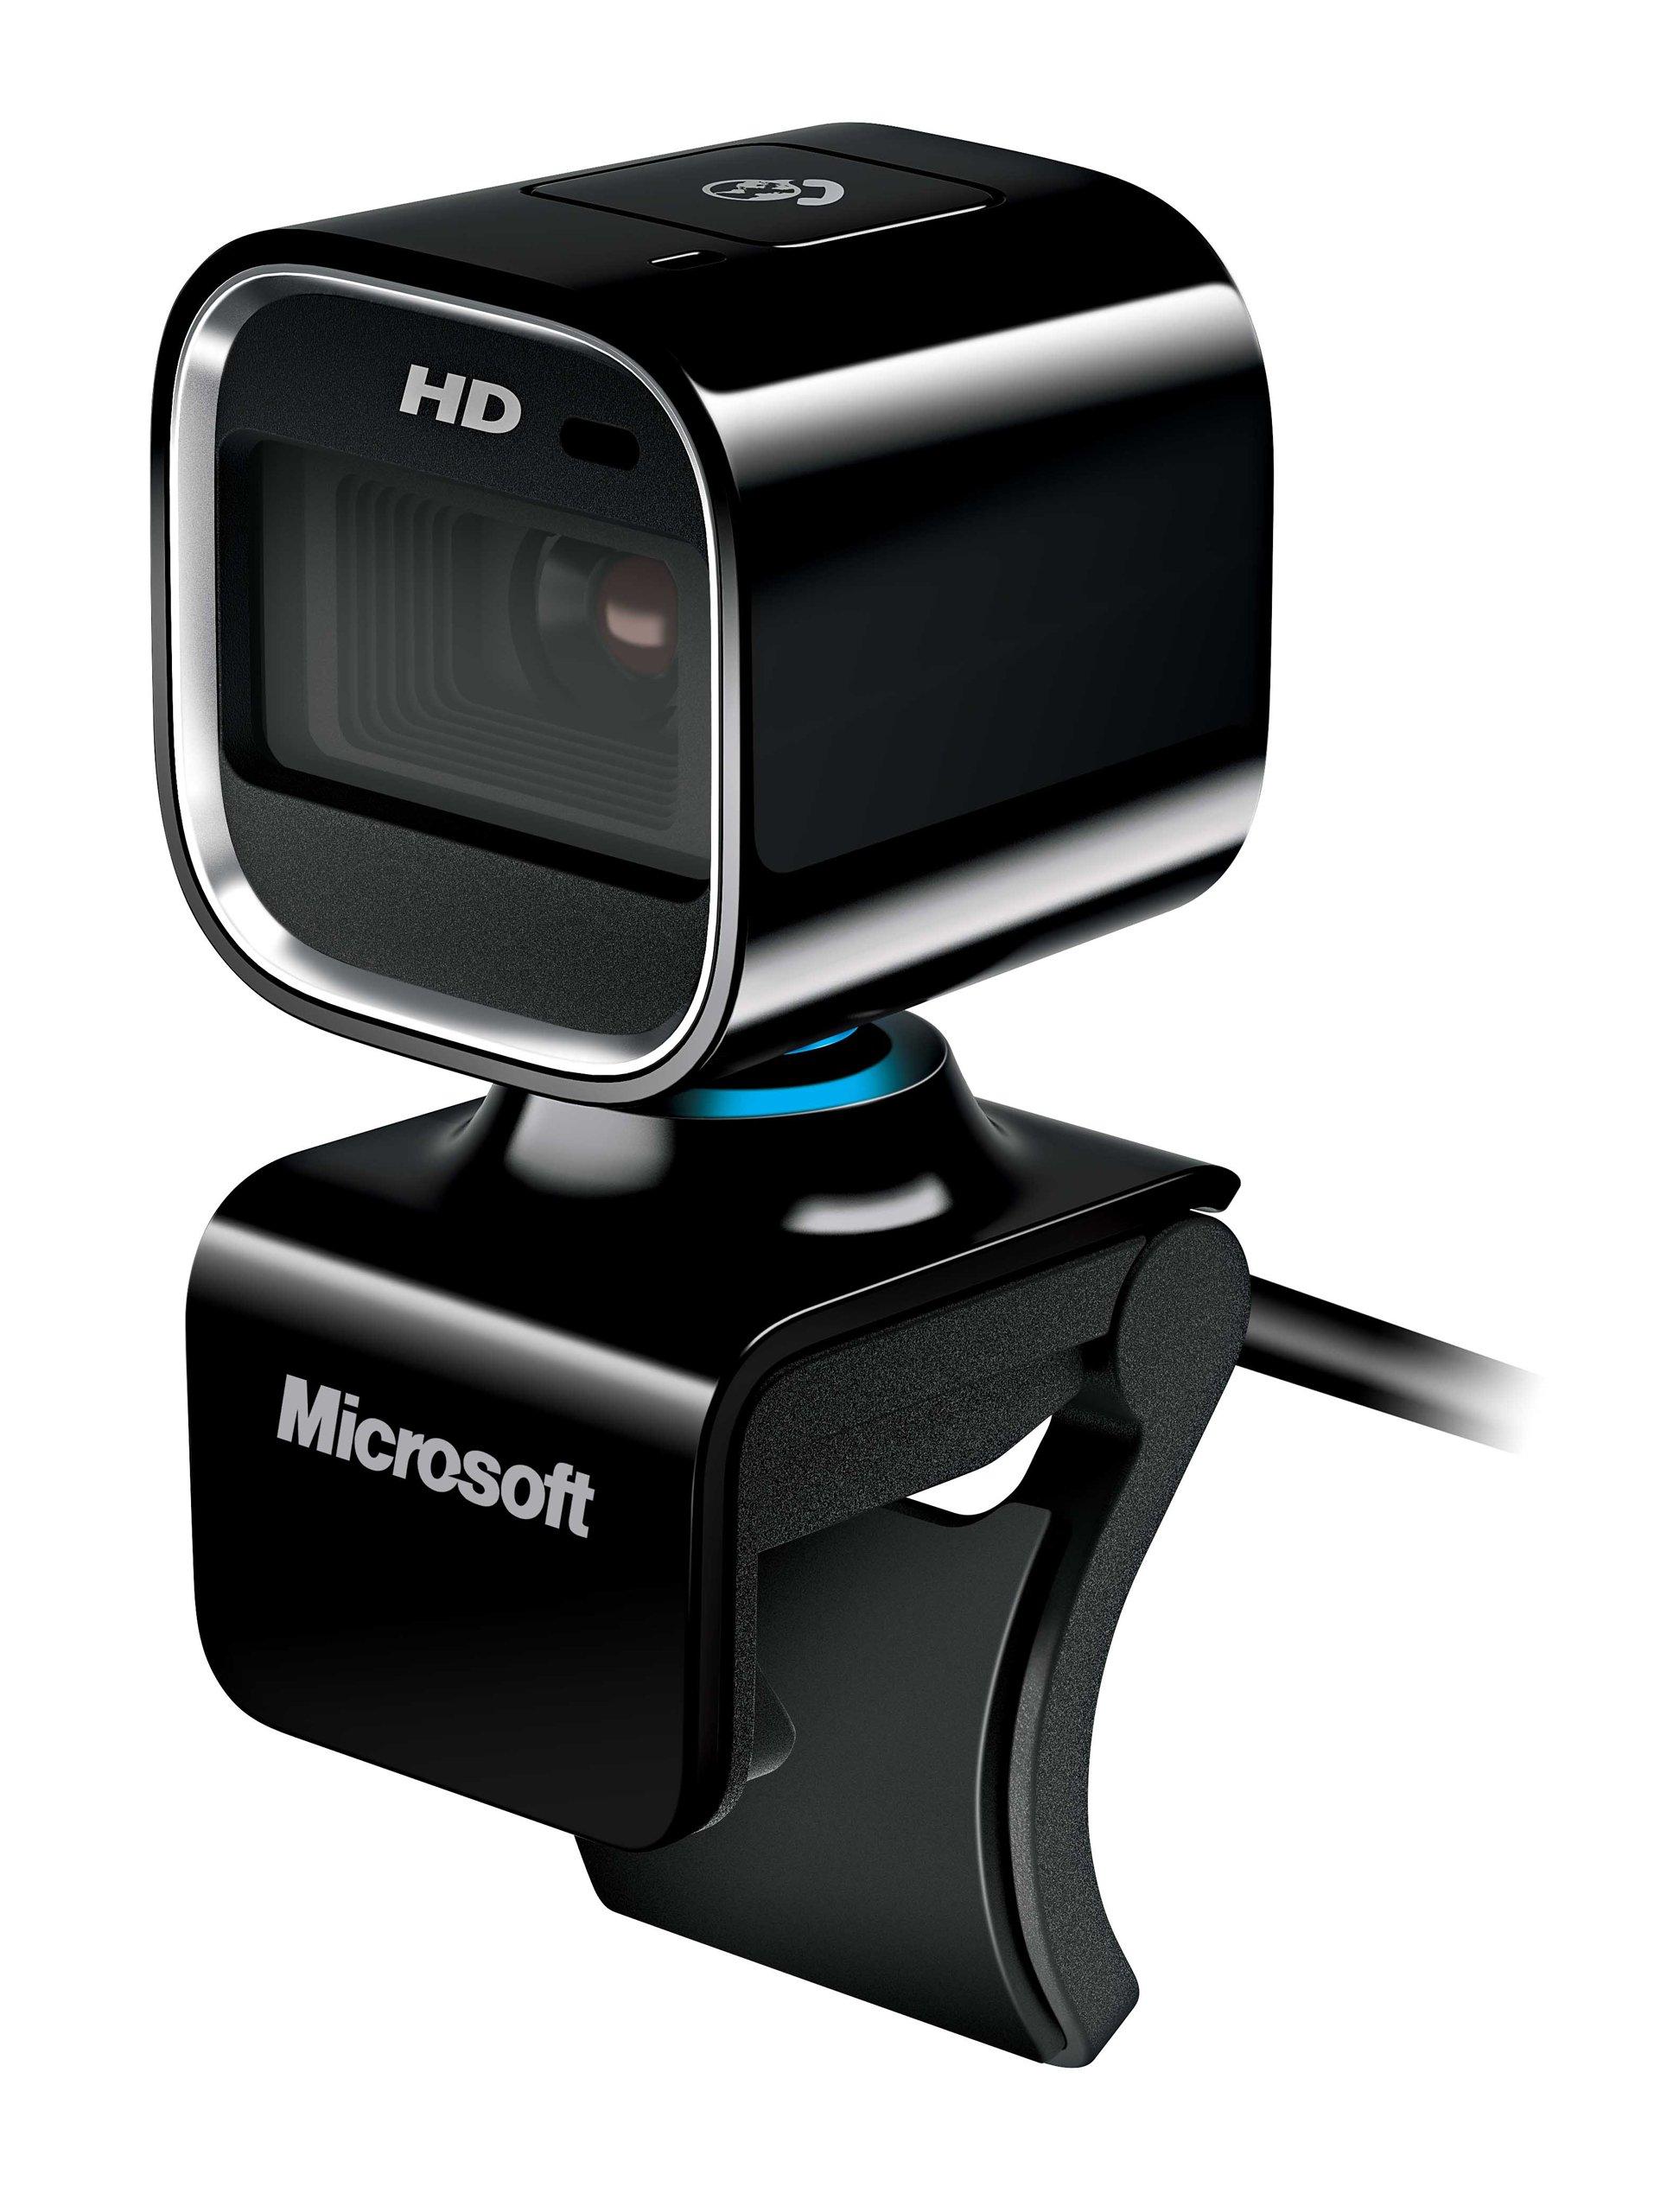 Microsoft LifeCam HD-6000 720p HD Webcam for Notebooks - Black